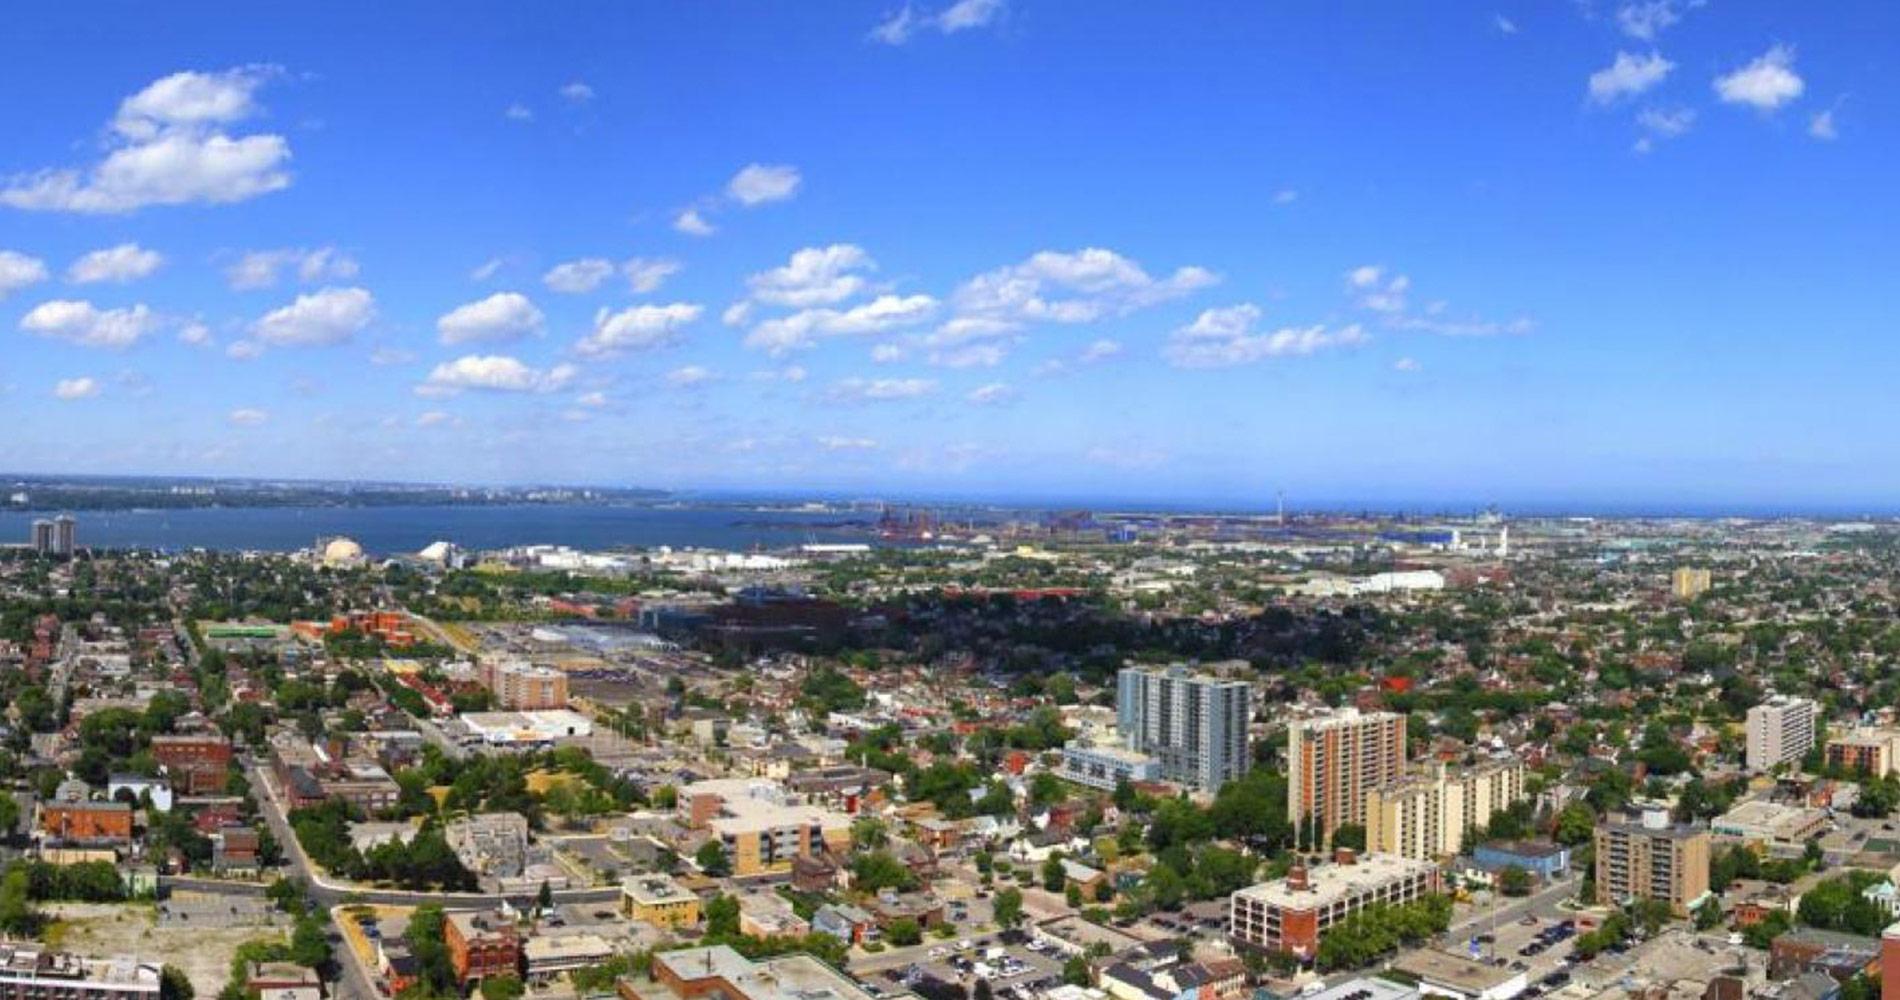 Cities-hamilton-ontario-commercia-residential-roofing